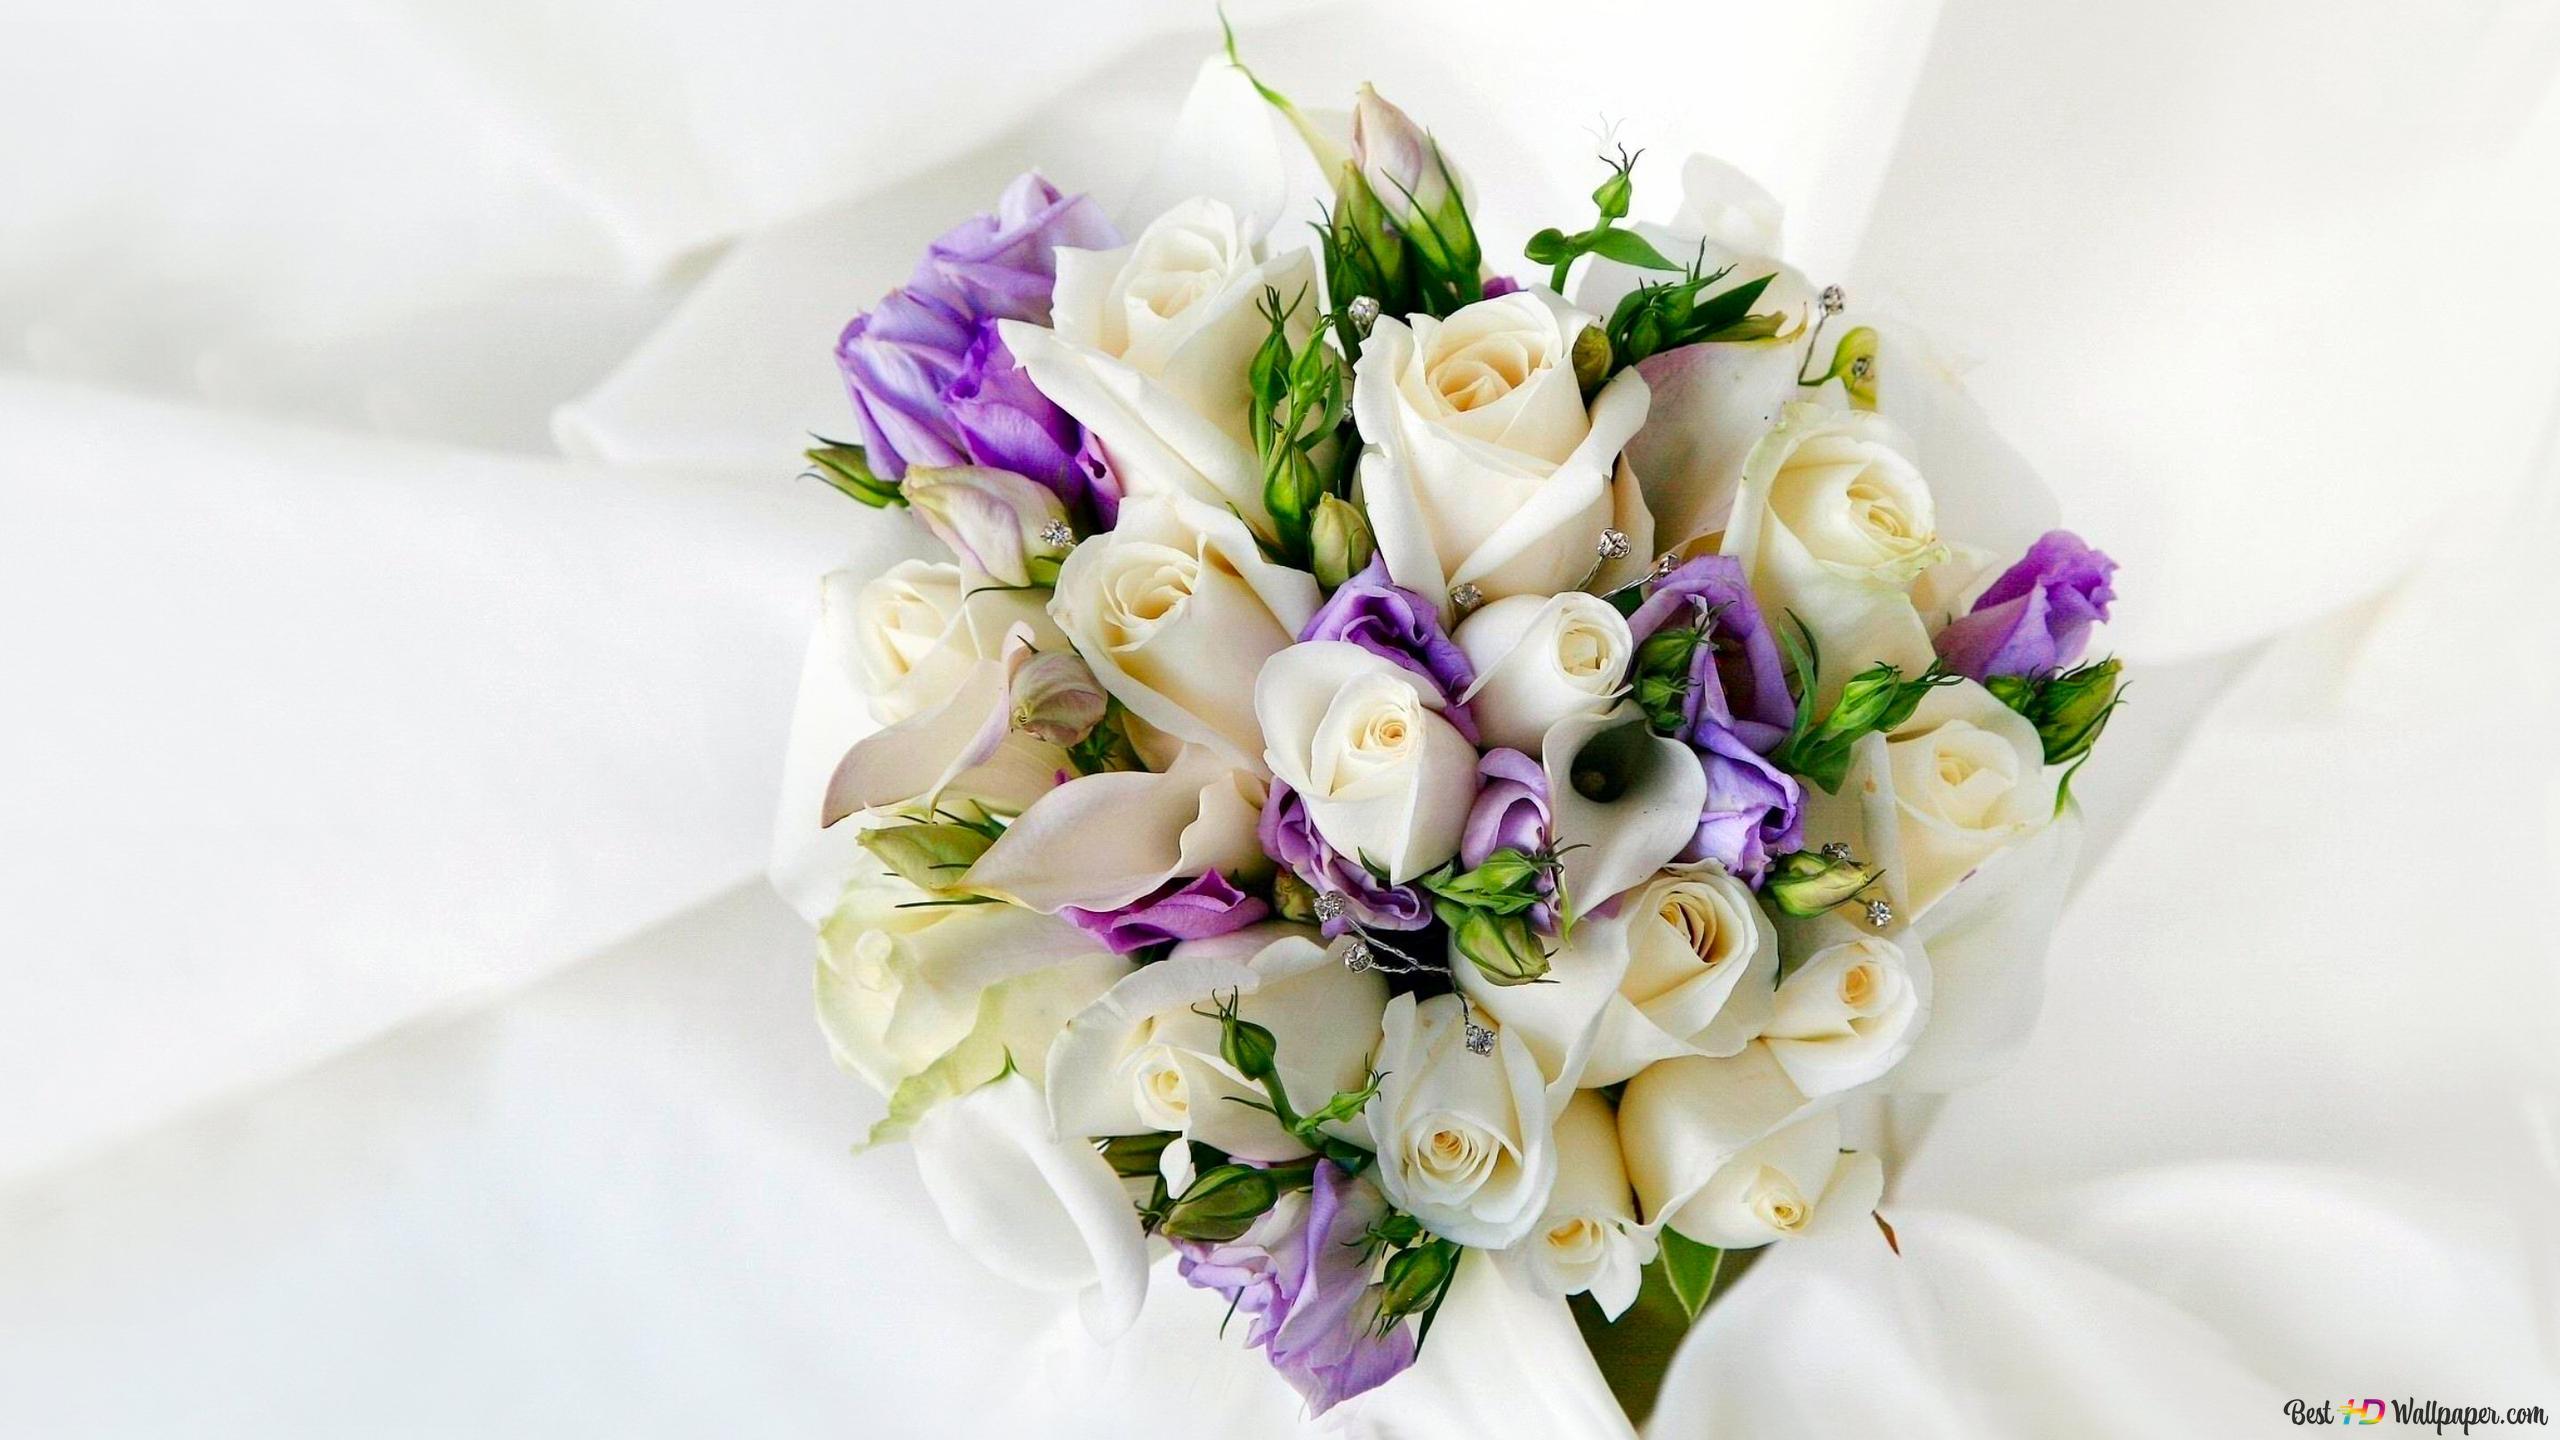 Descargar Fondo De Pantalla Día De San Valentín Rosas Blancas Ramo Hd